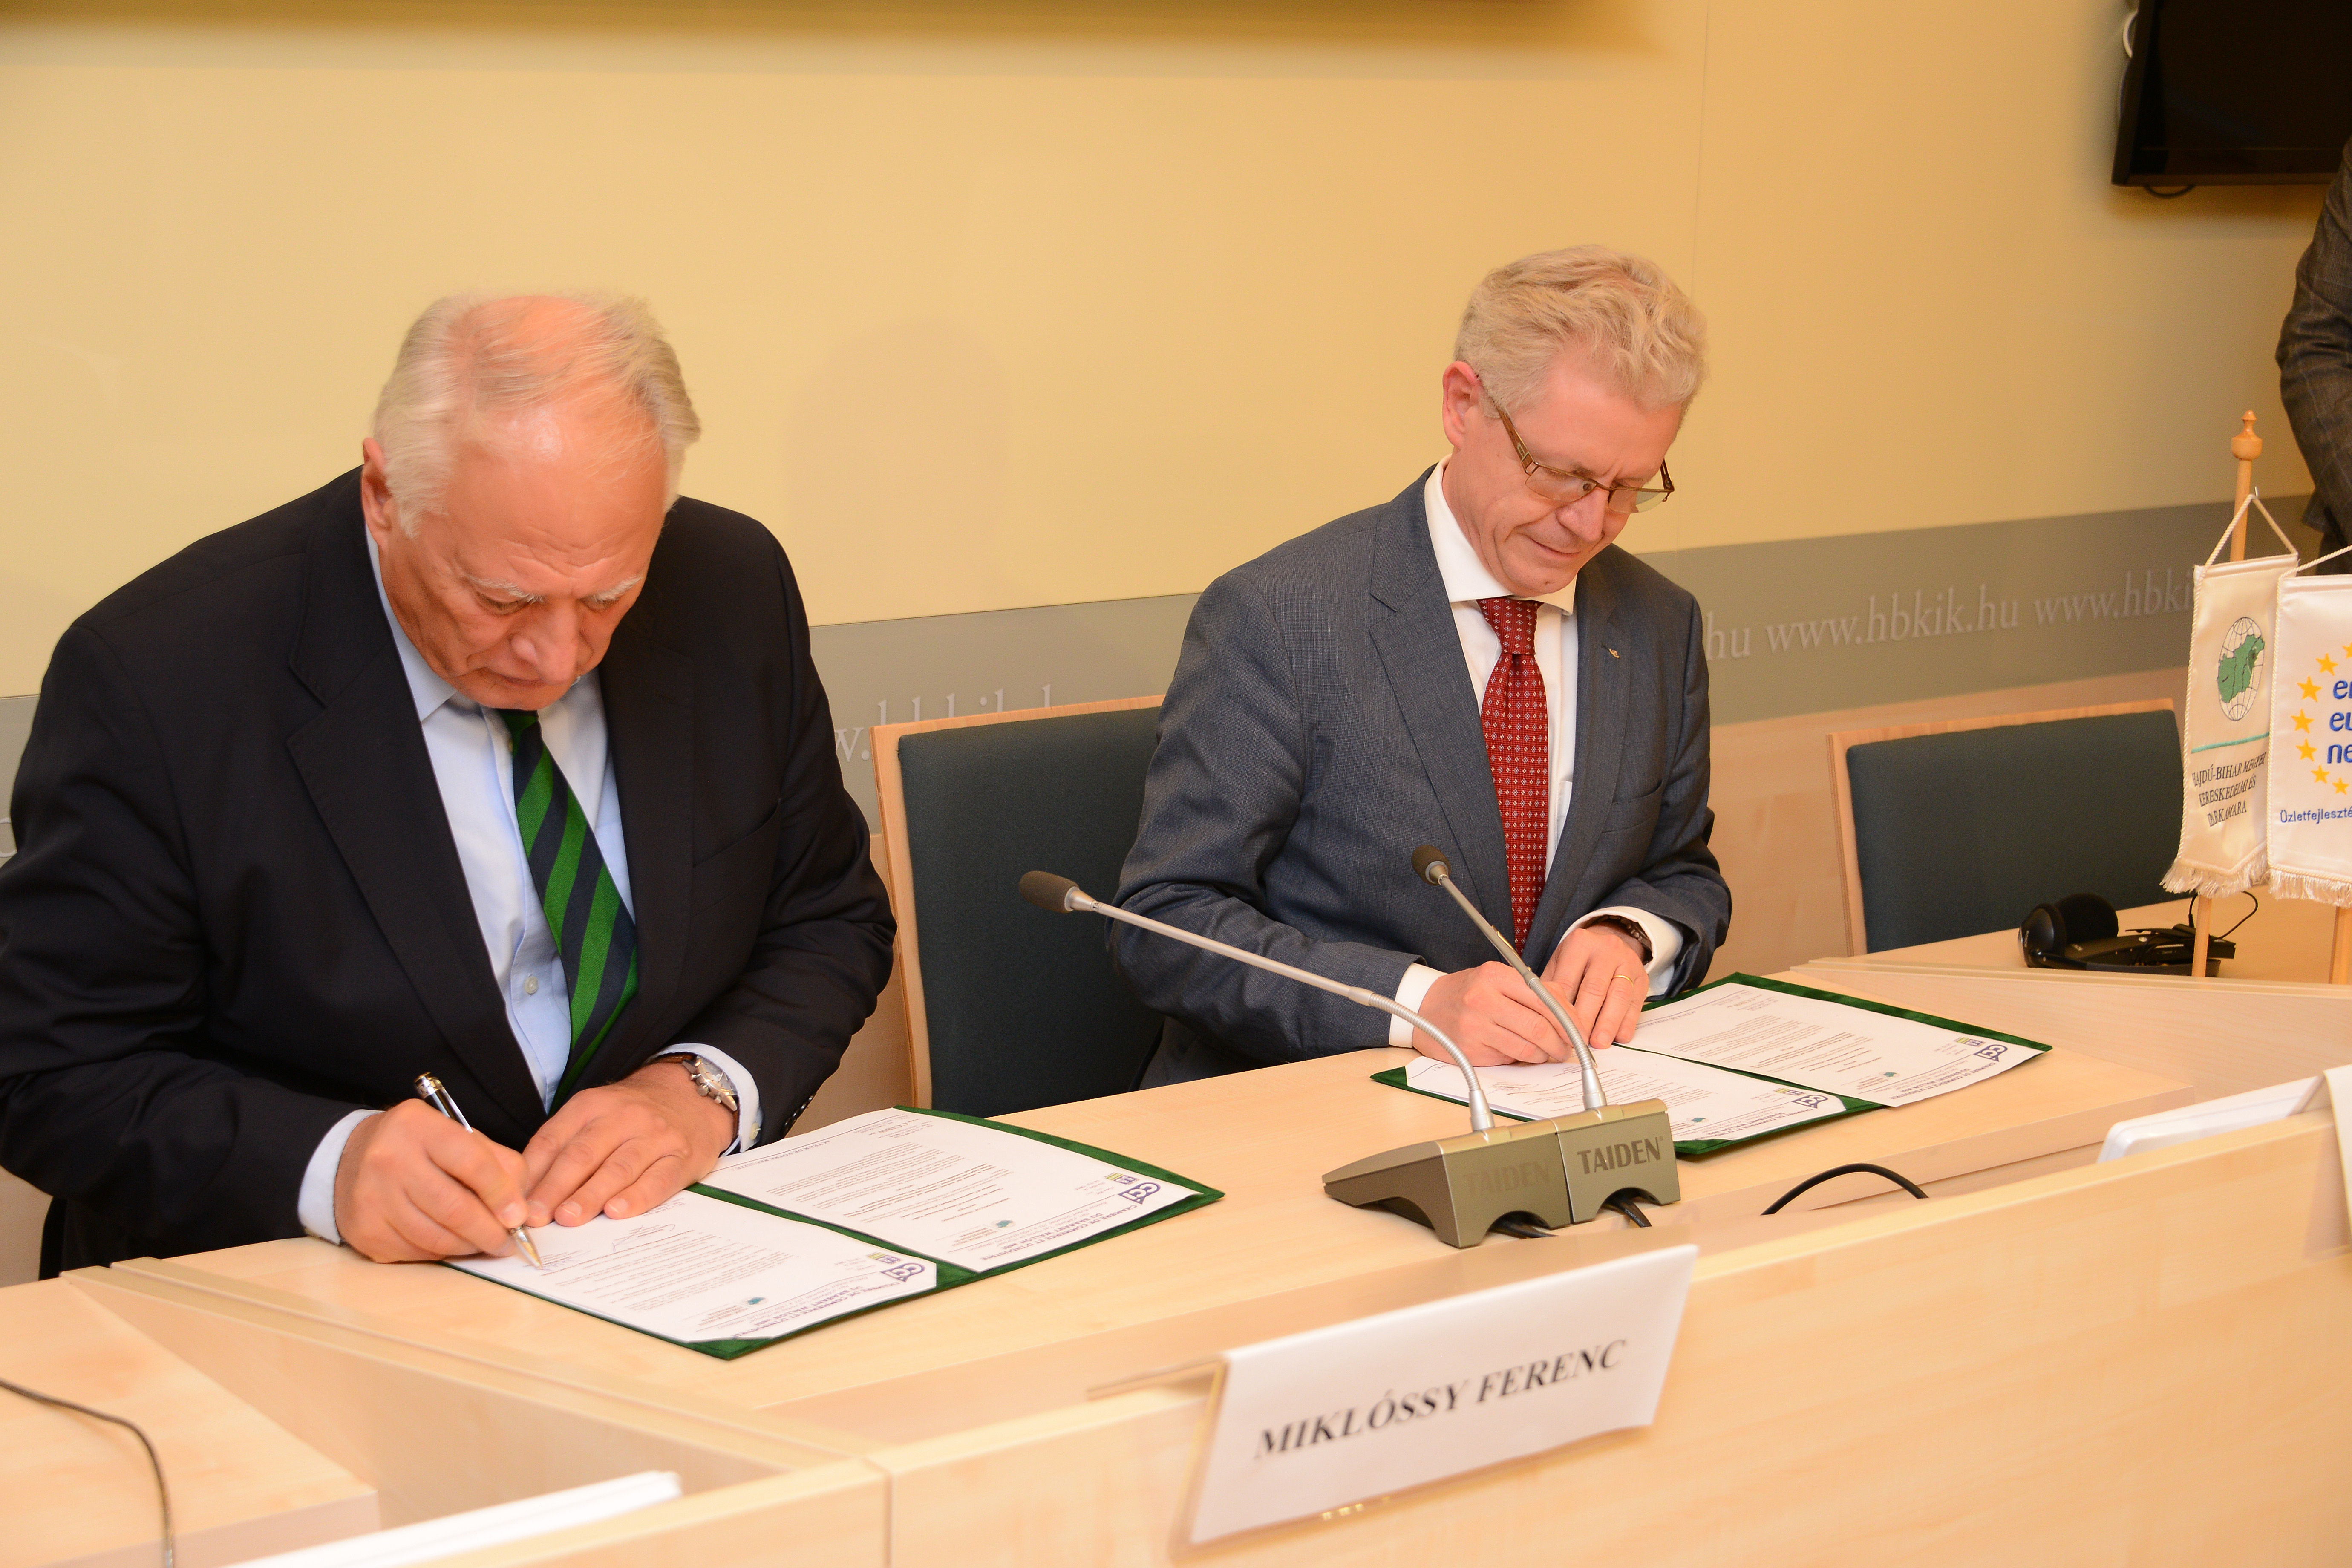 Ccibw debrecen accord signature ccibw chambre de - Chambre de commerce et d industrie du havre ...